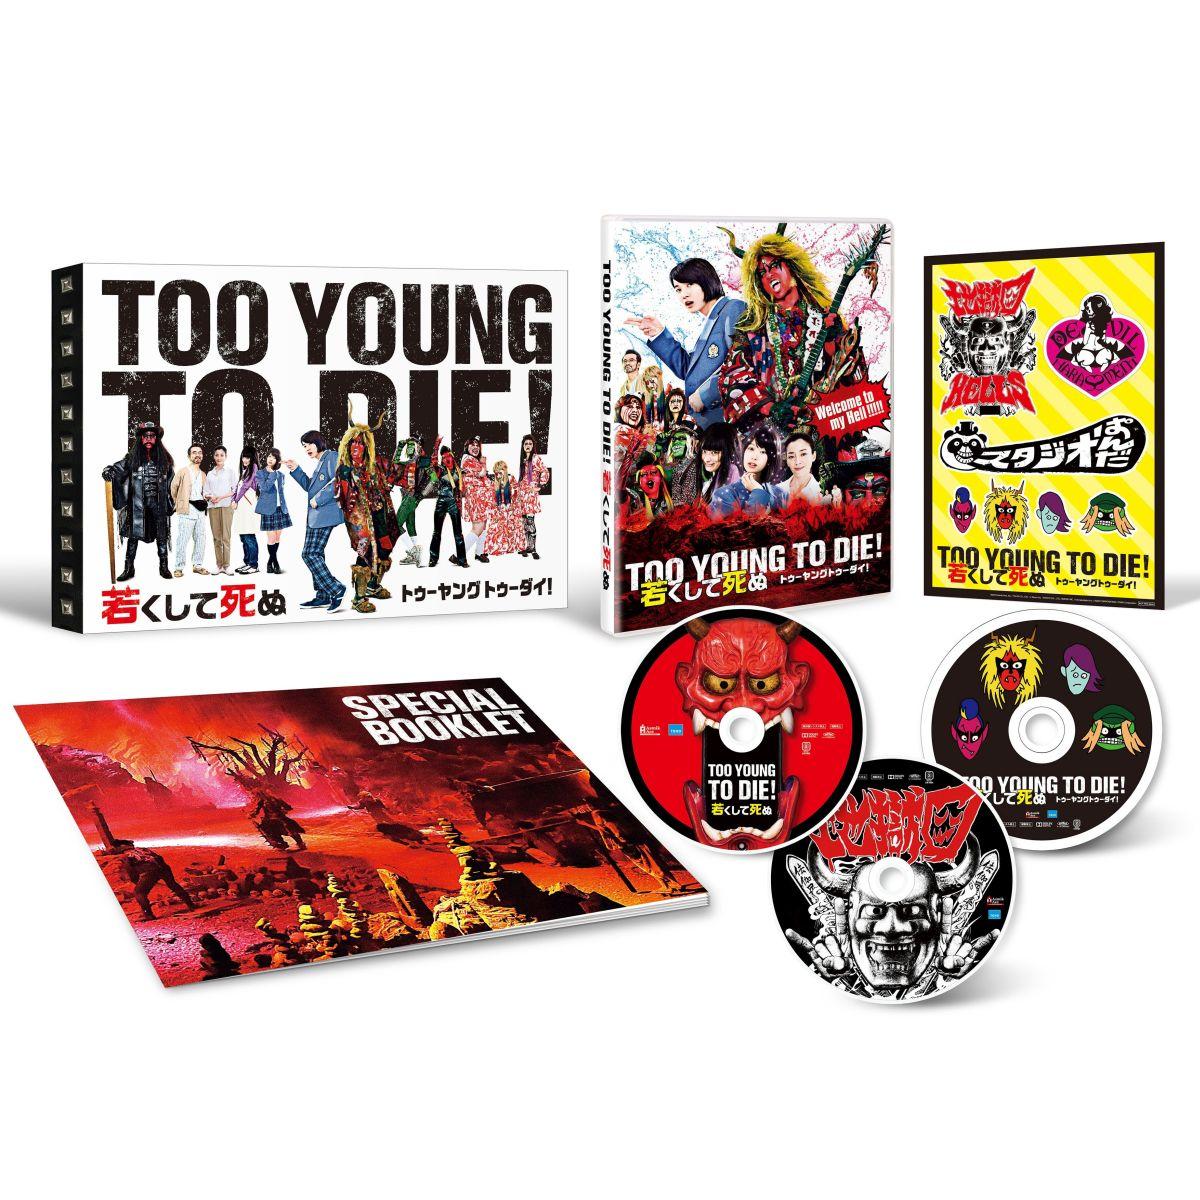 TOO YOUNG TO DIE! 若くして死ぬ Blu-ray 豪華版[TBR-26327D][Blu-ray/ブルーレイ] 製品画像